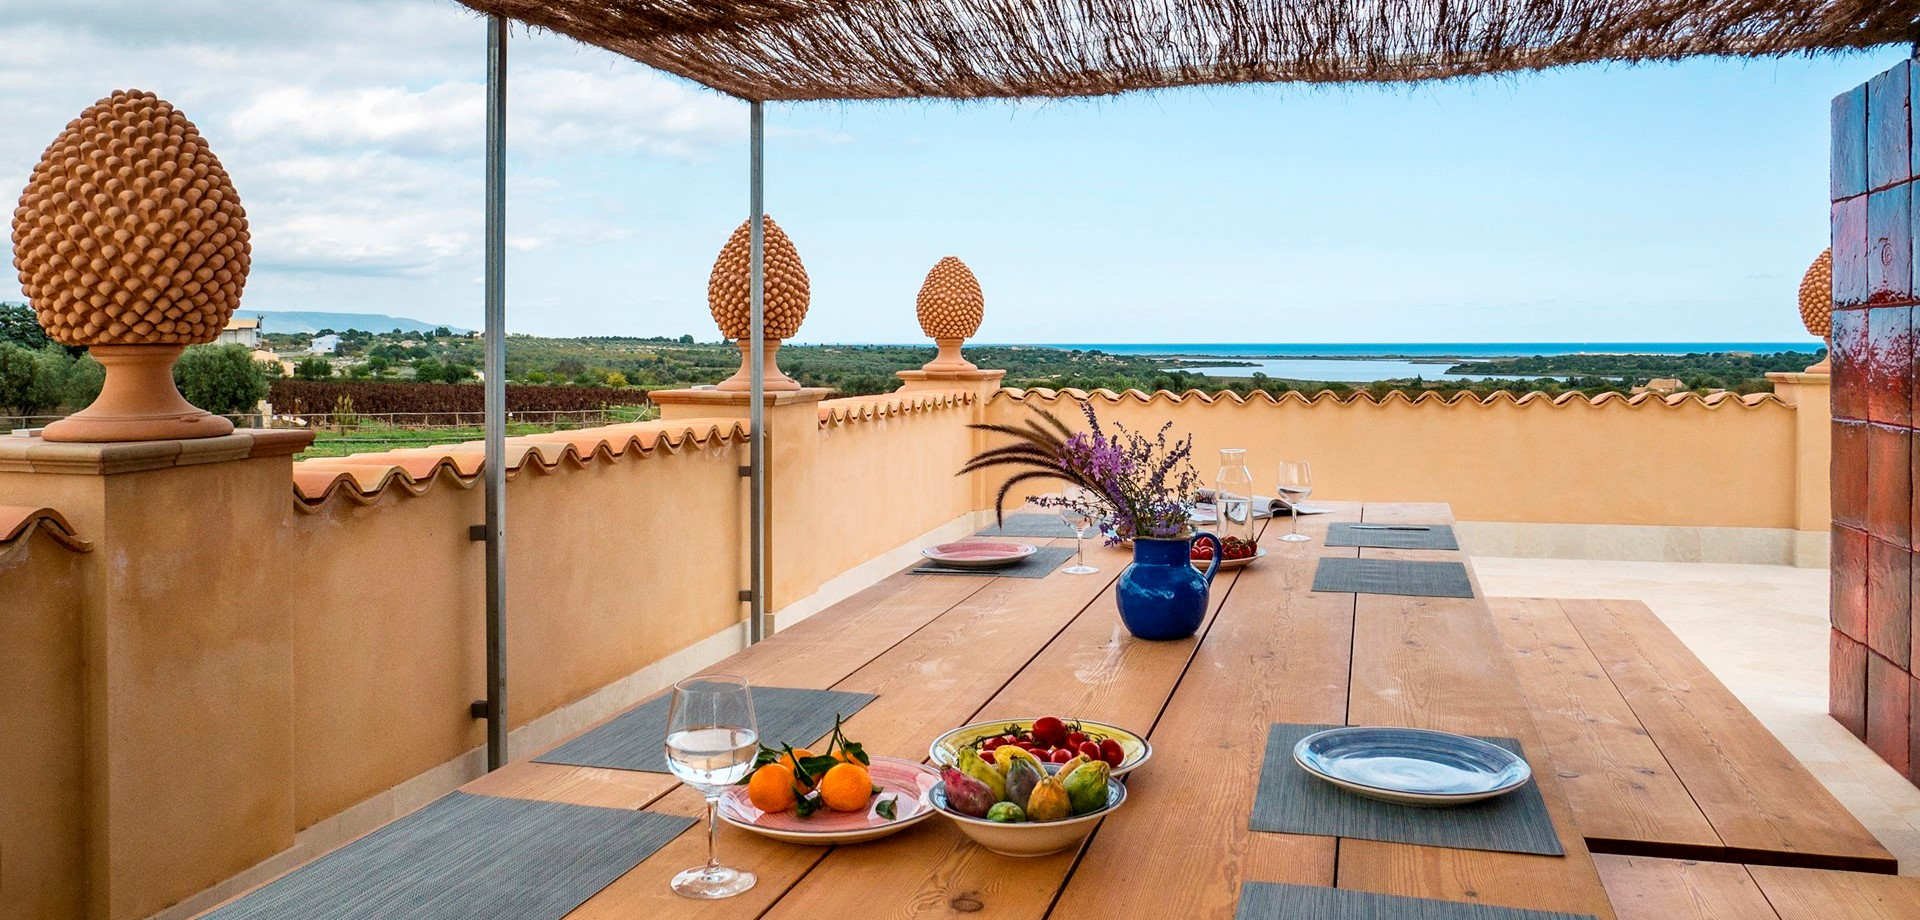 villa-dell-aquila-roof-terrace-dining